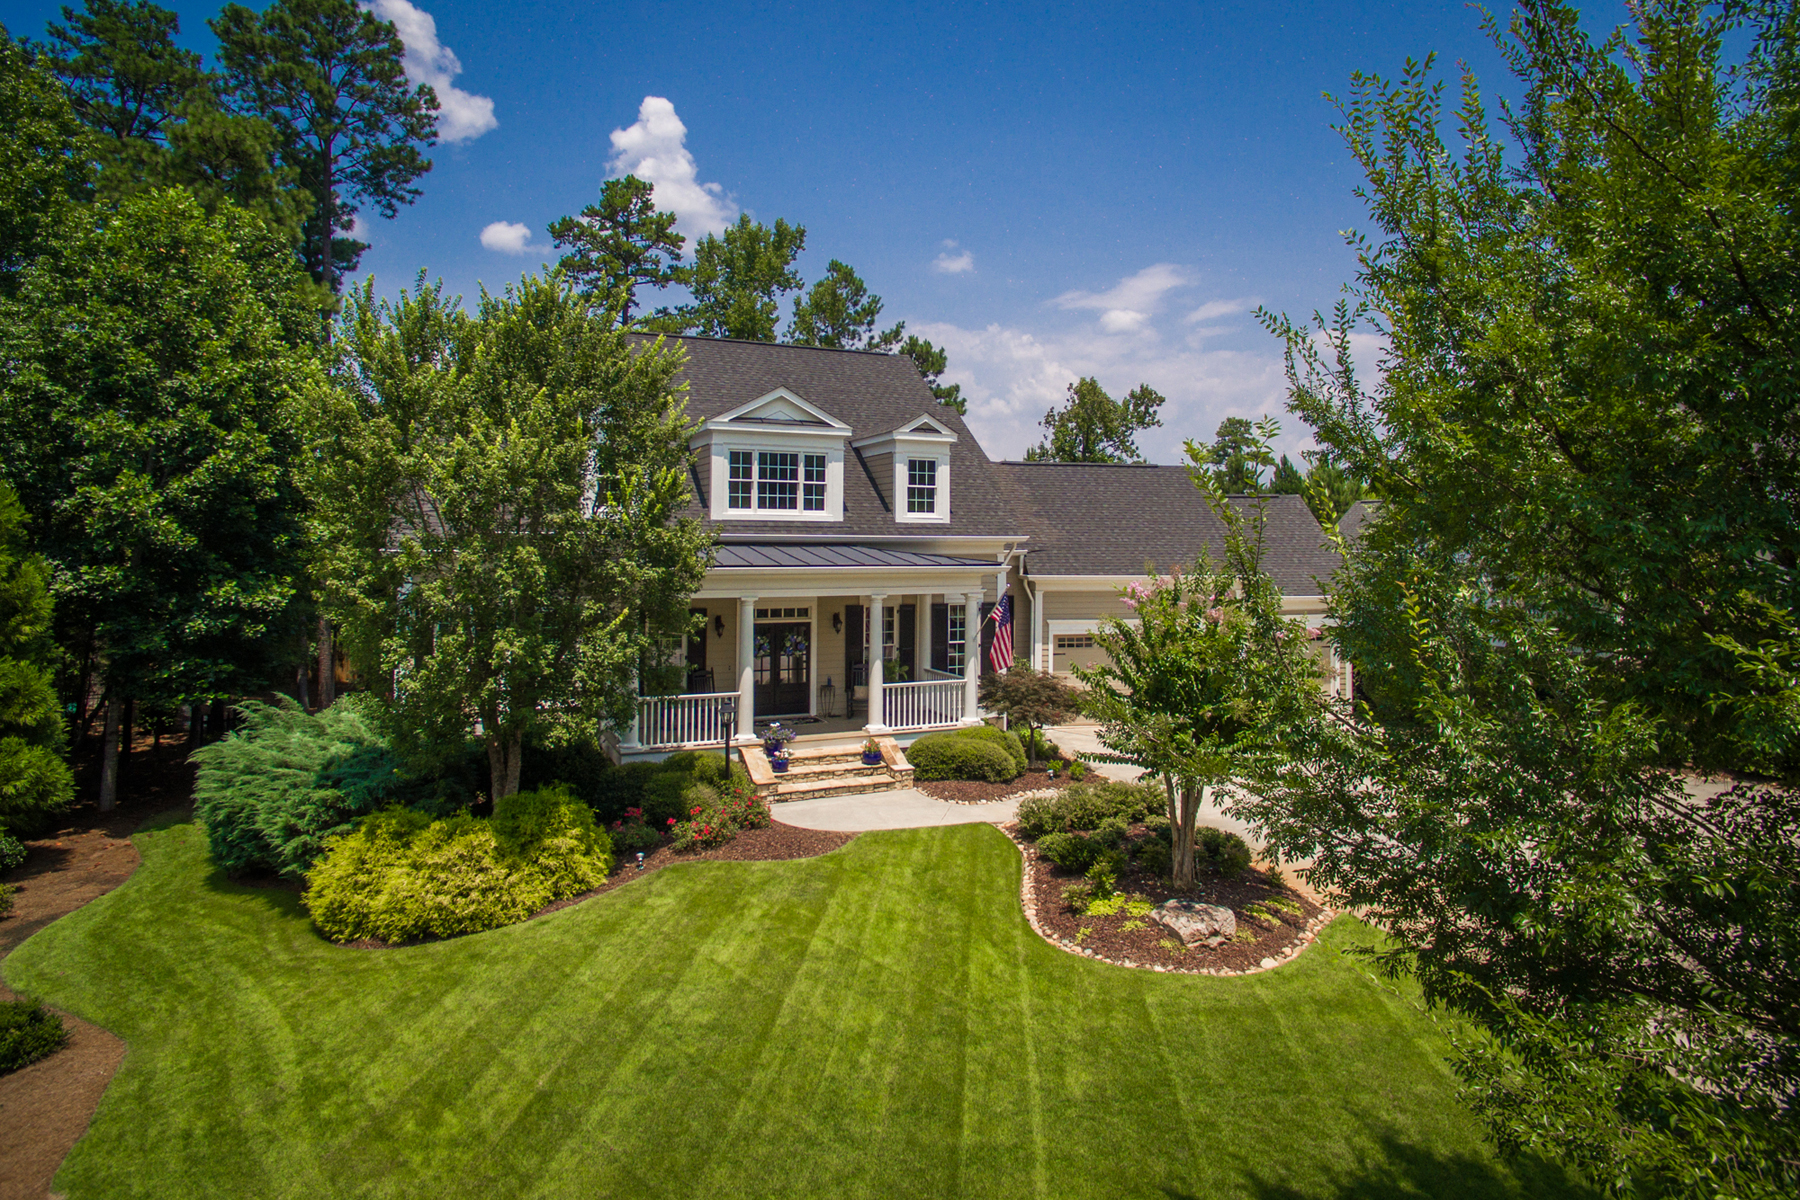 Nhà ở một gia đình vì Bán tại Immaculate Highgrove Home With Outstanding Finishes And Details 235 Highgrove Drive Fayetteville, Georgia 30215 Hoa Kỳ